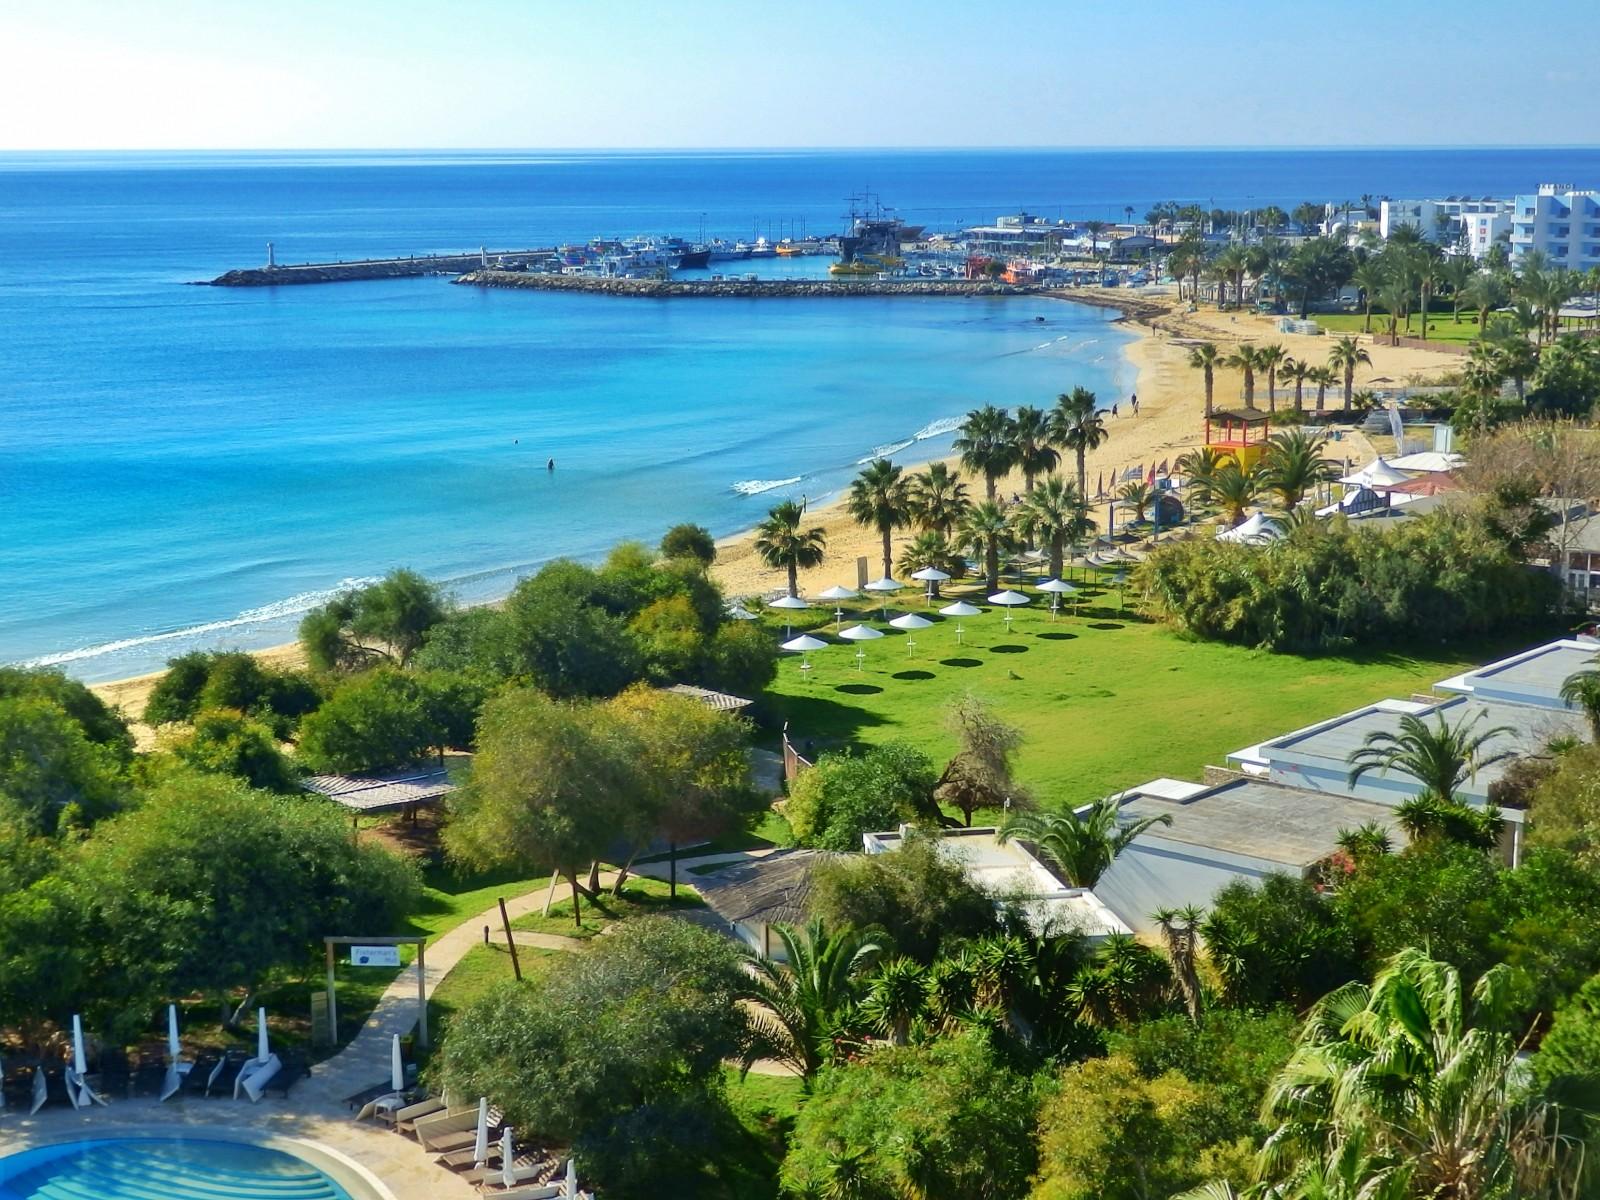 LATO 2018: Grecian Bay Hotel*****, 7 dni (07-14.09.2018 r.), śniadania: 4369,00 PLN/osoba